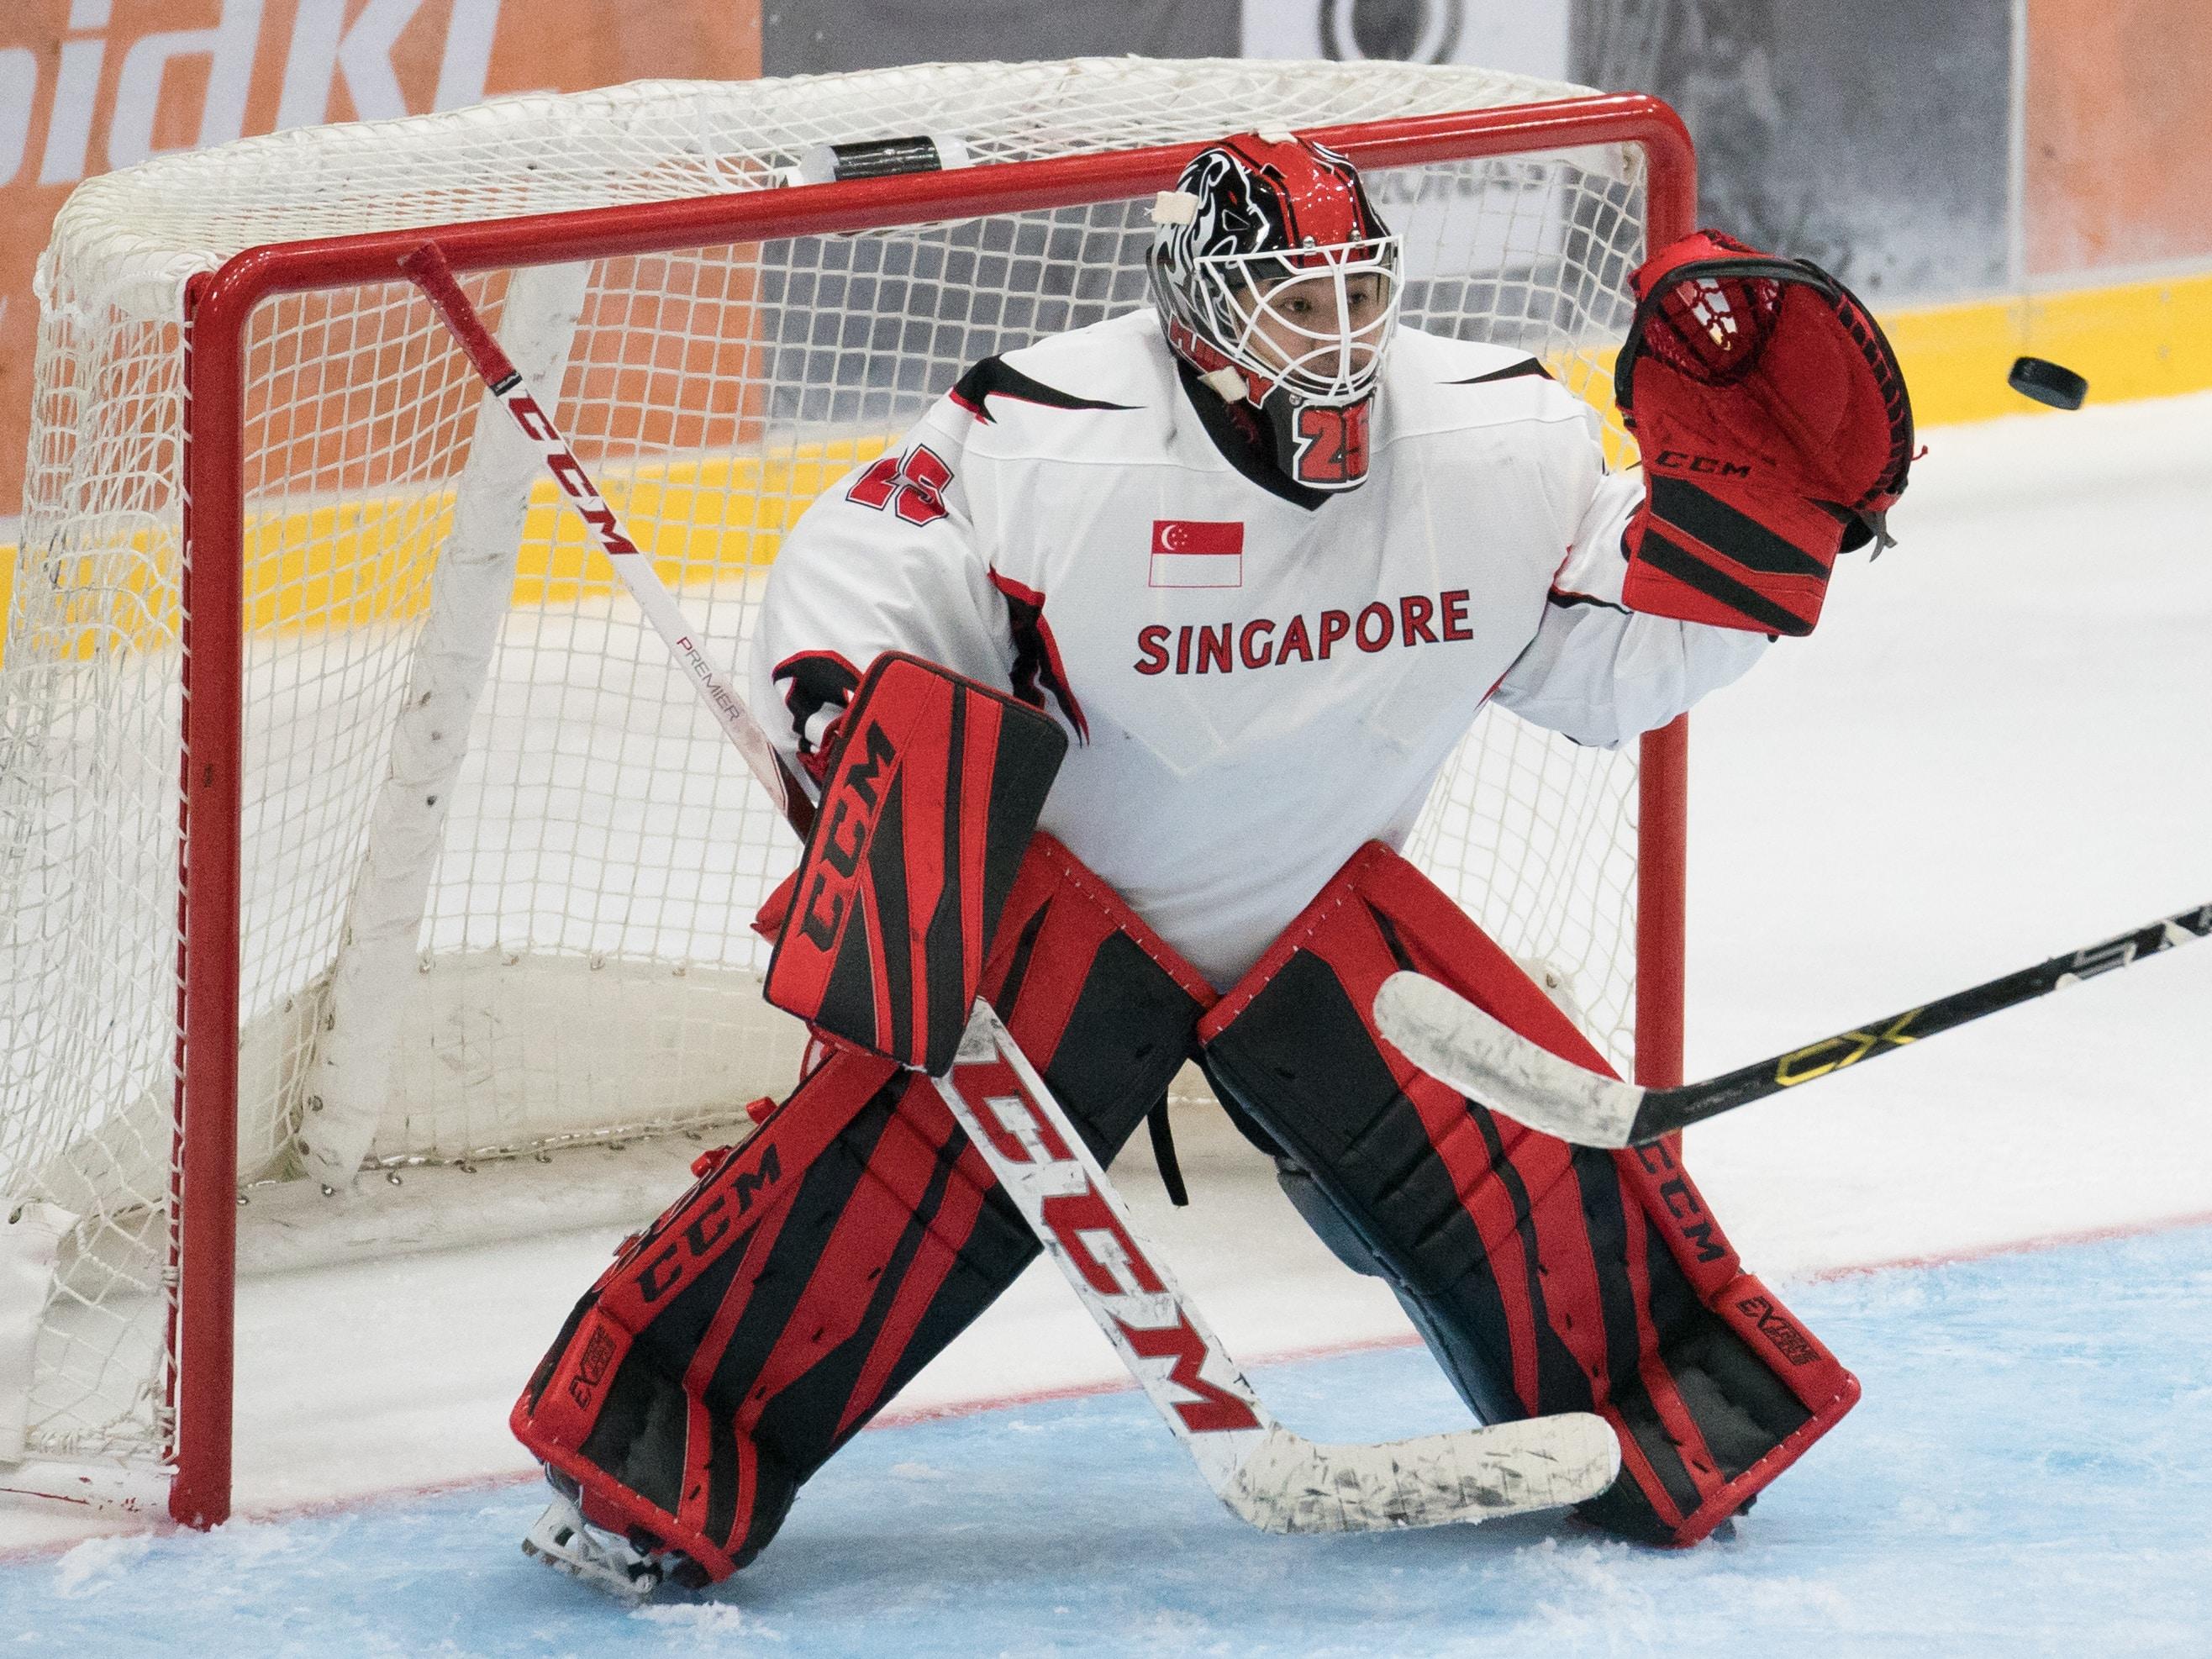 hockey goalie showing defense pose during game